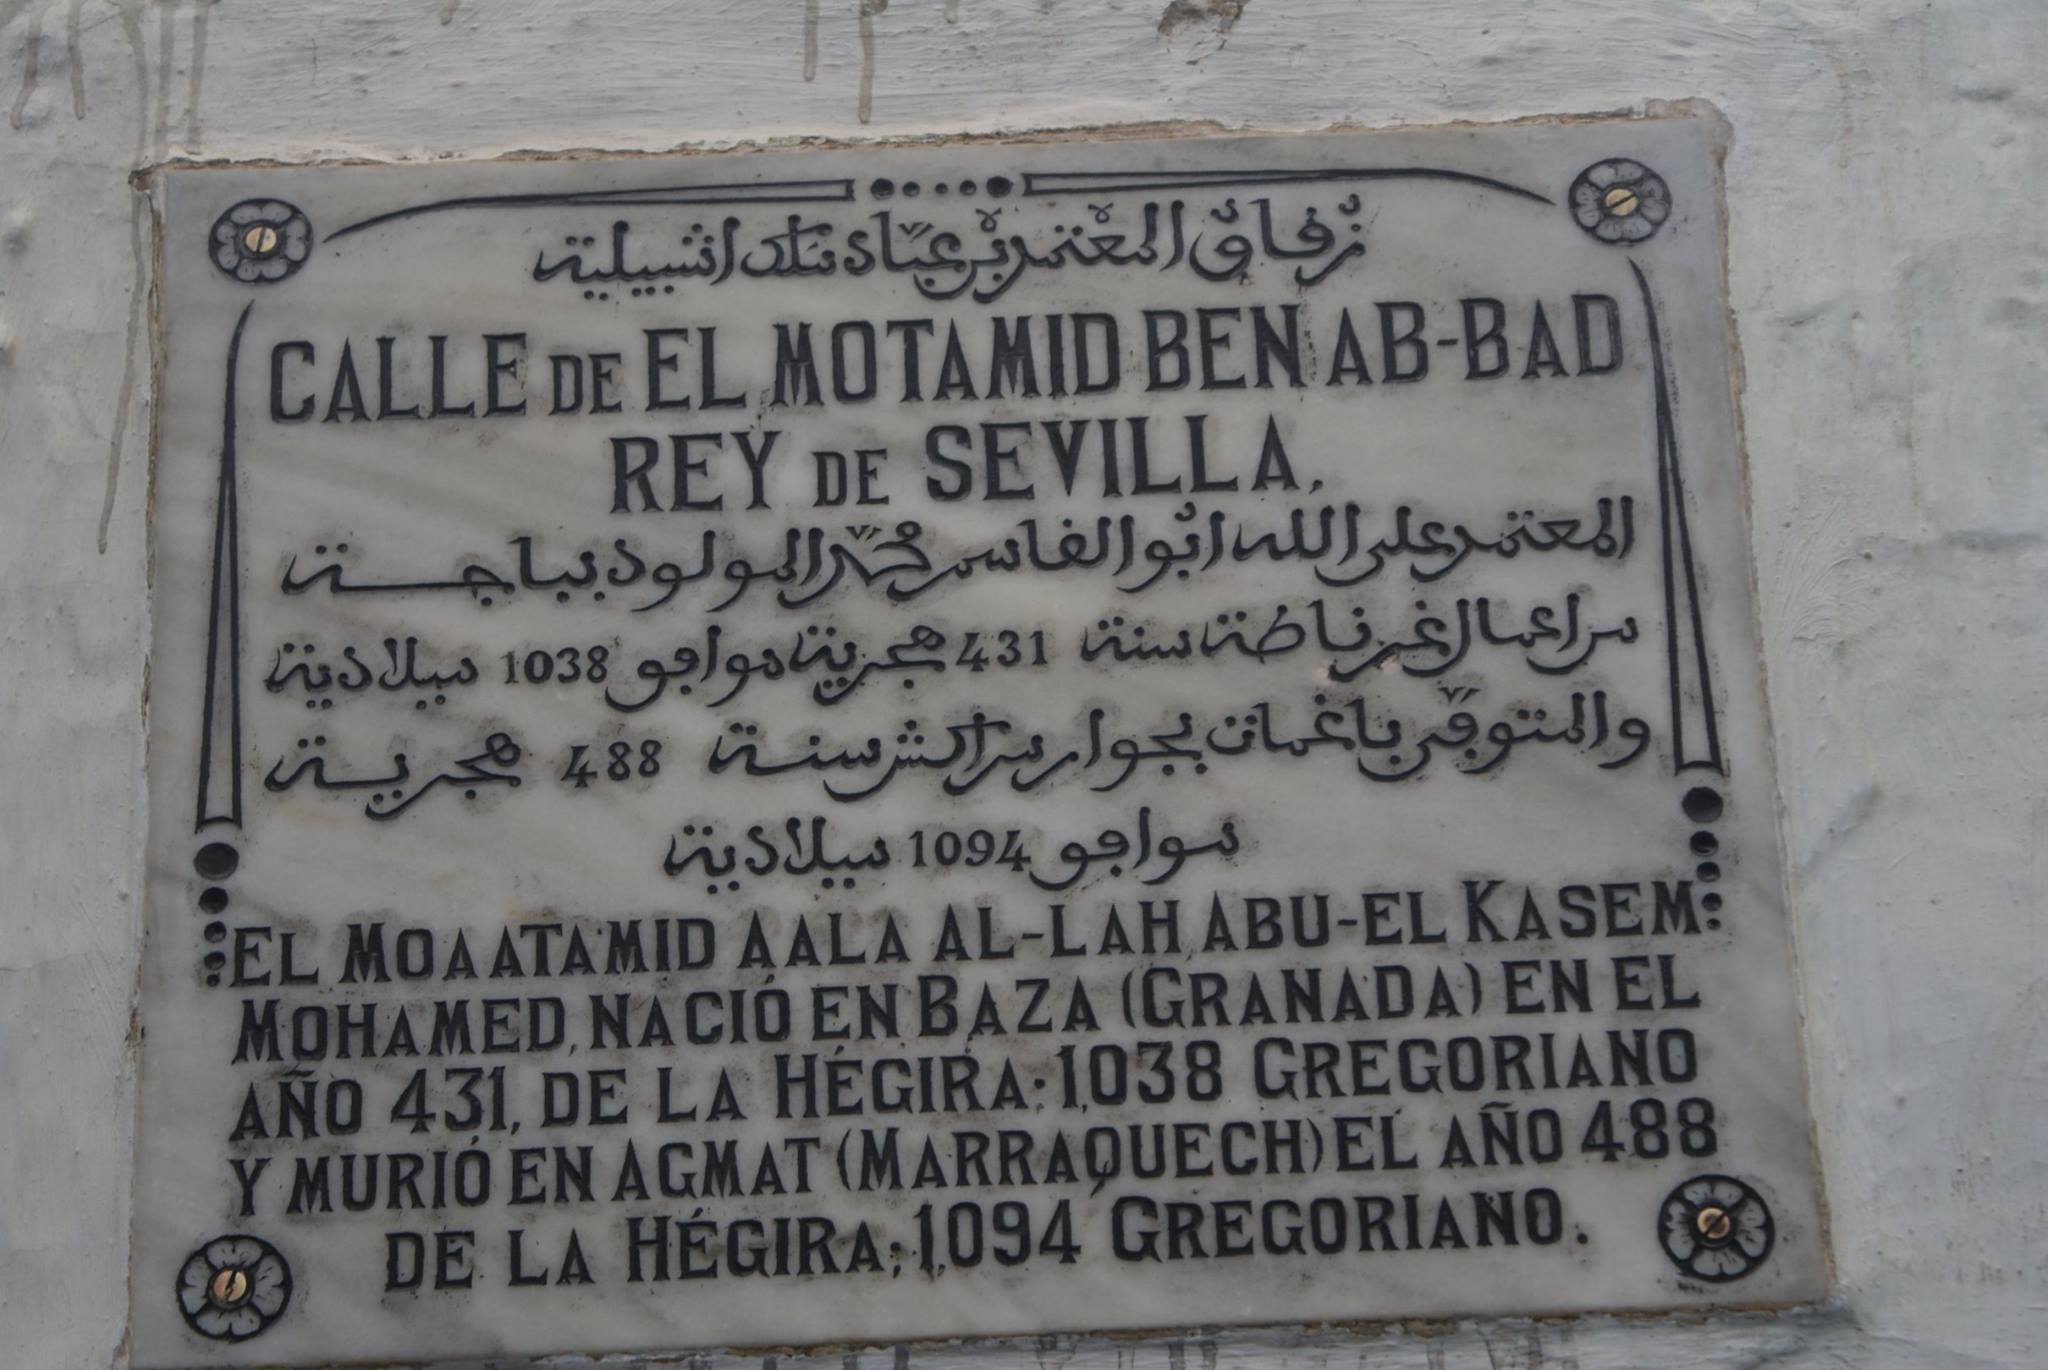 calle-rey-el-moaatamid